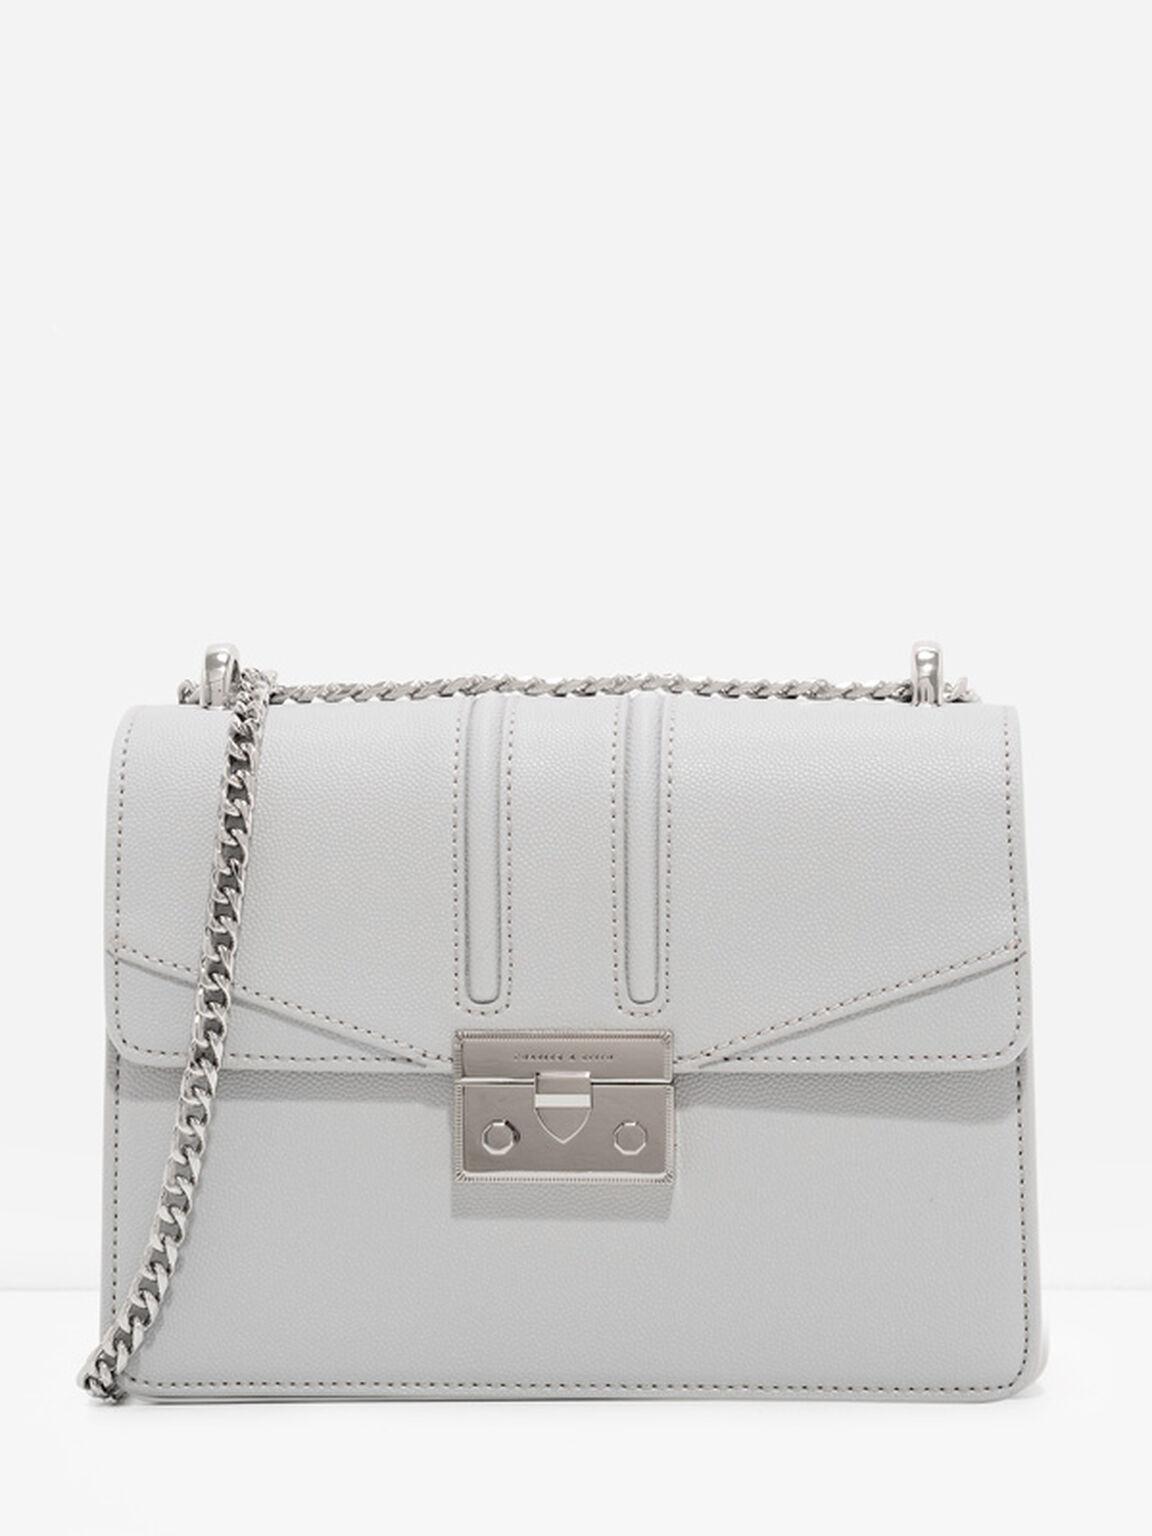 Metallic Accent Chain Strap Shoulder Bag, Light Grey, hi-res